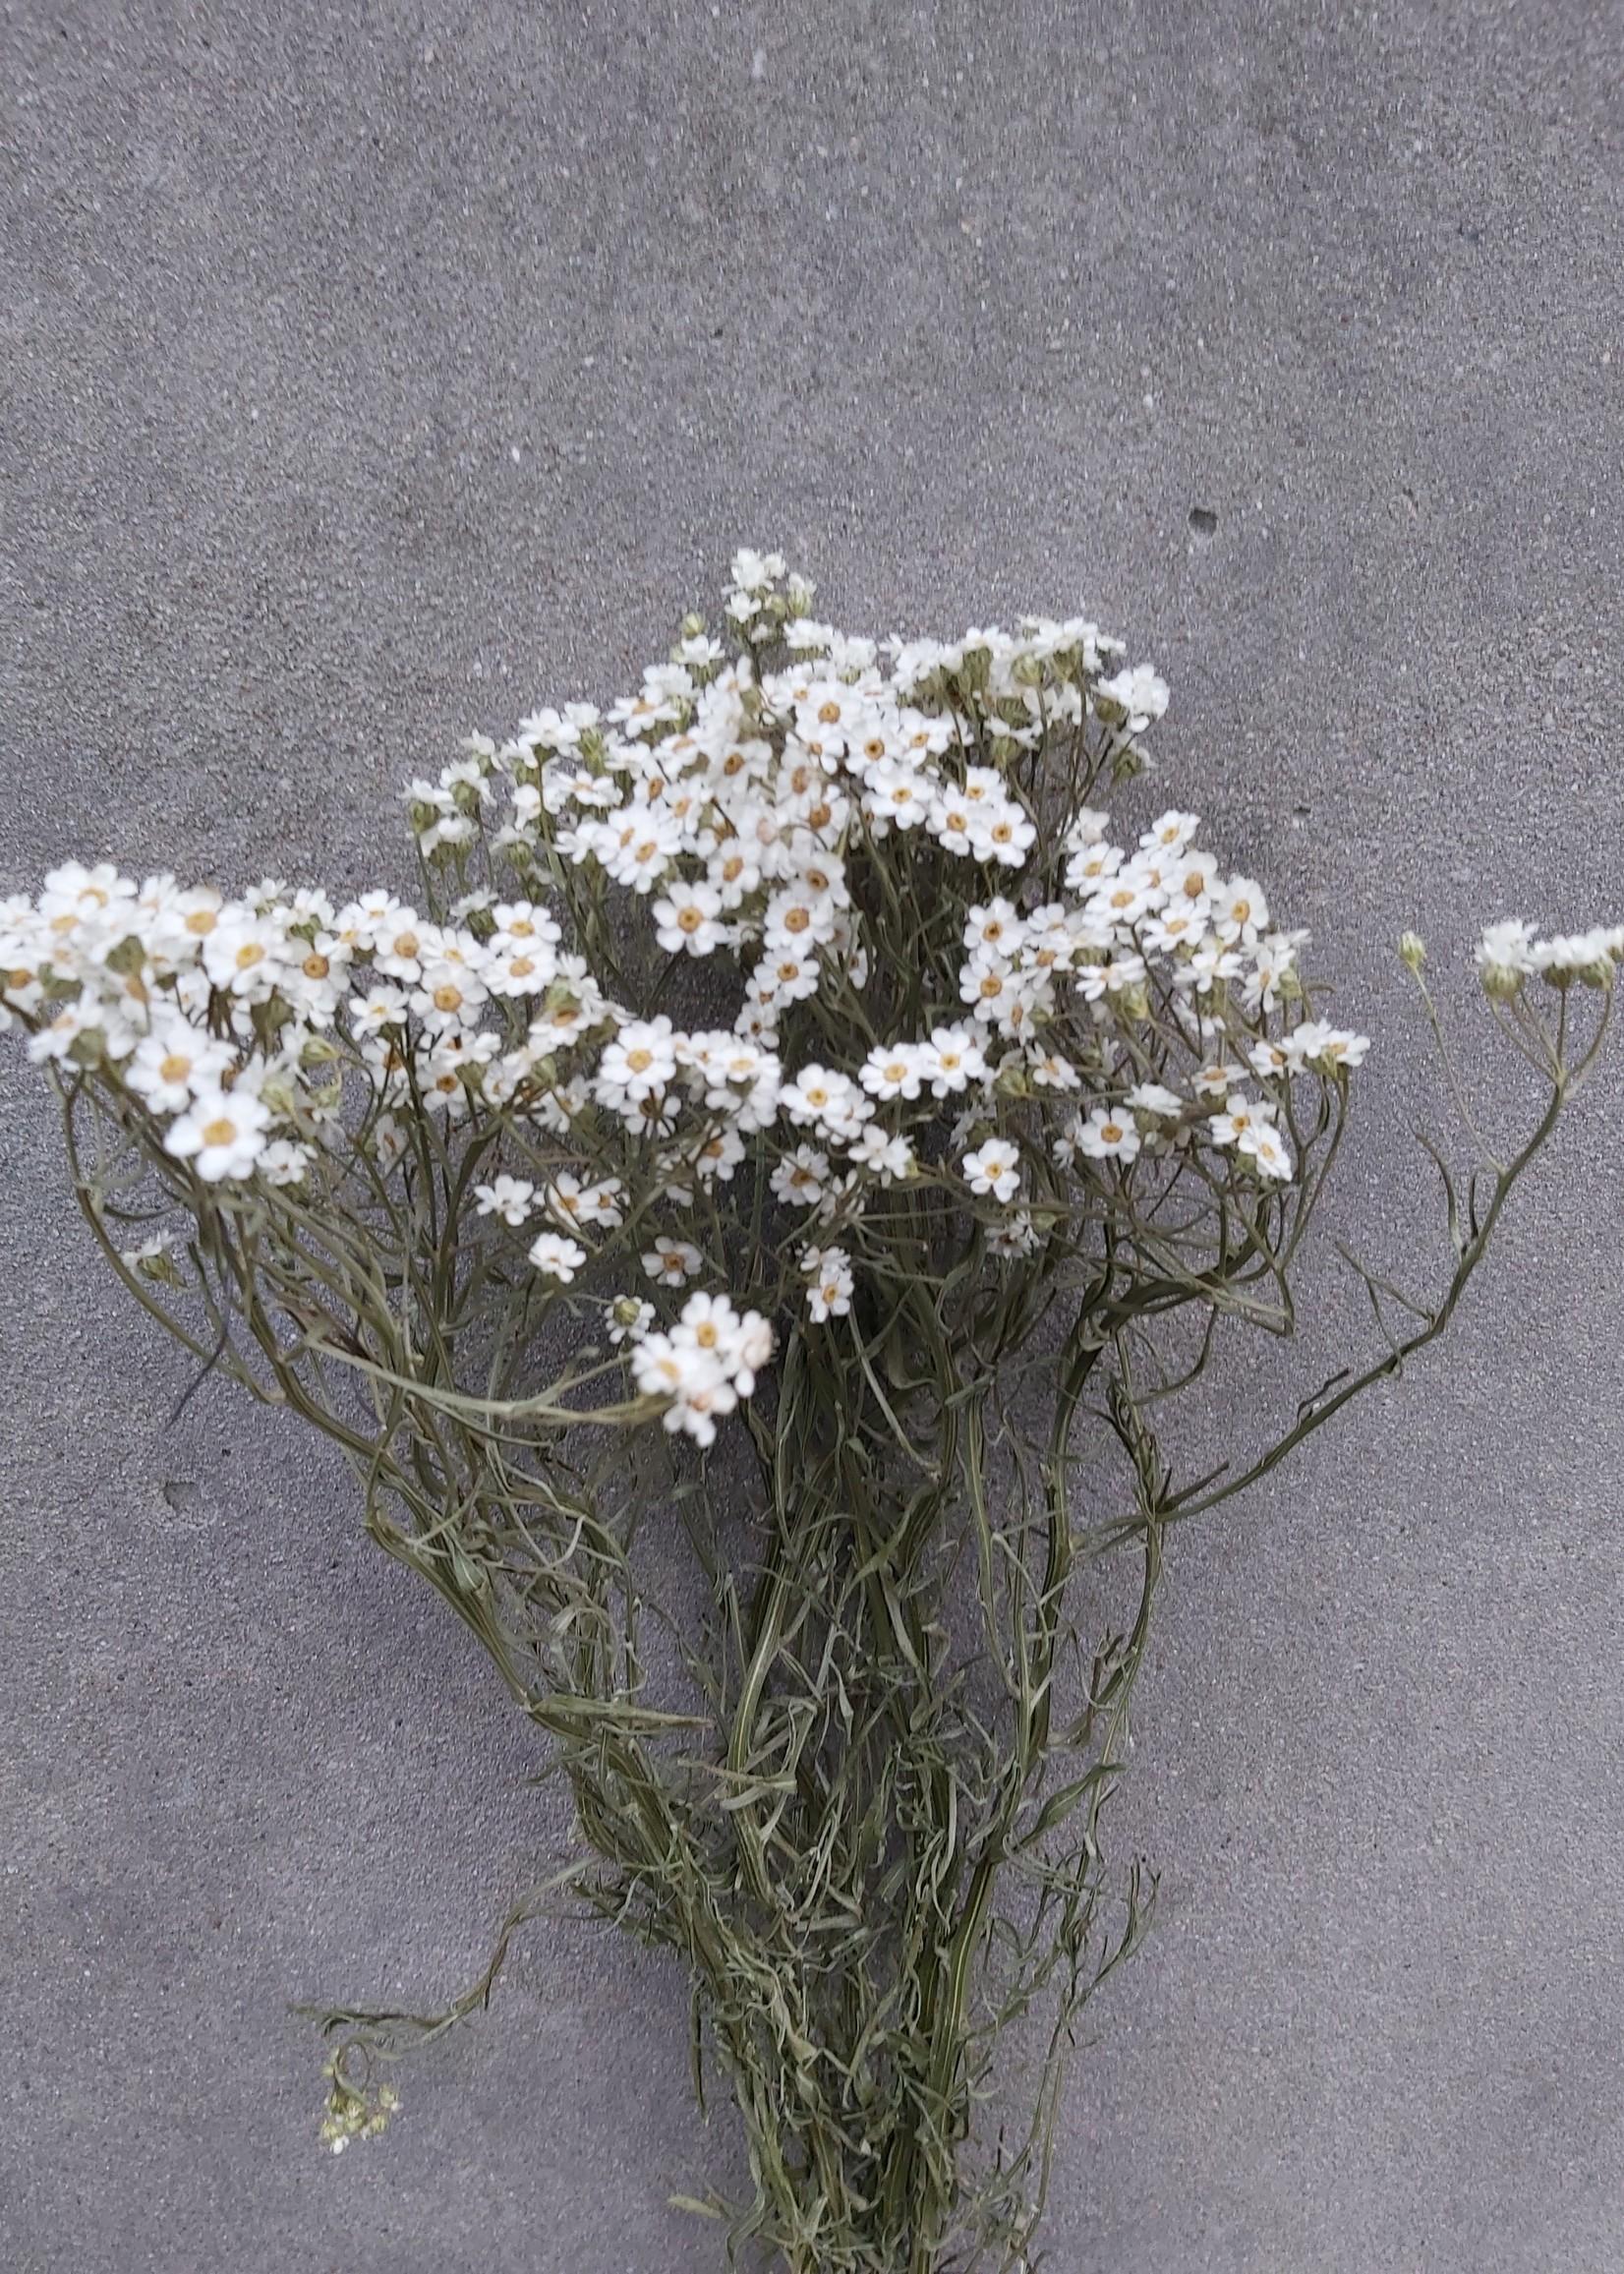 Gedroogde witte Ixodia per bosje van 30 - 40 cm